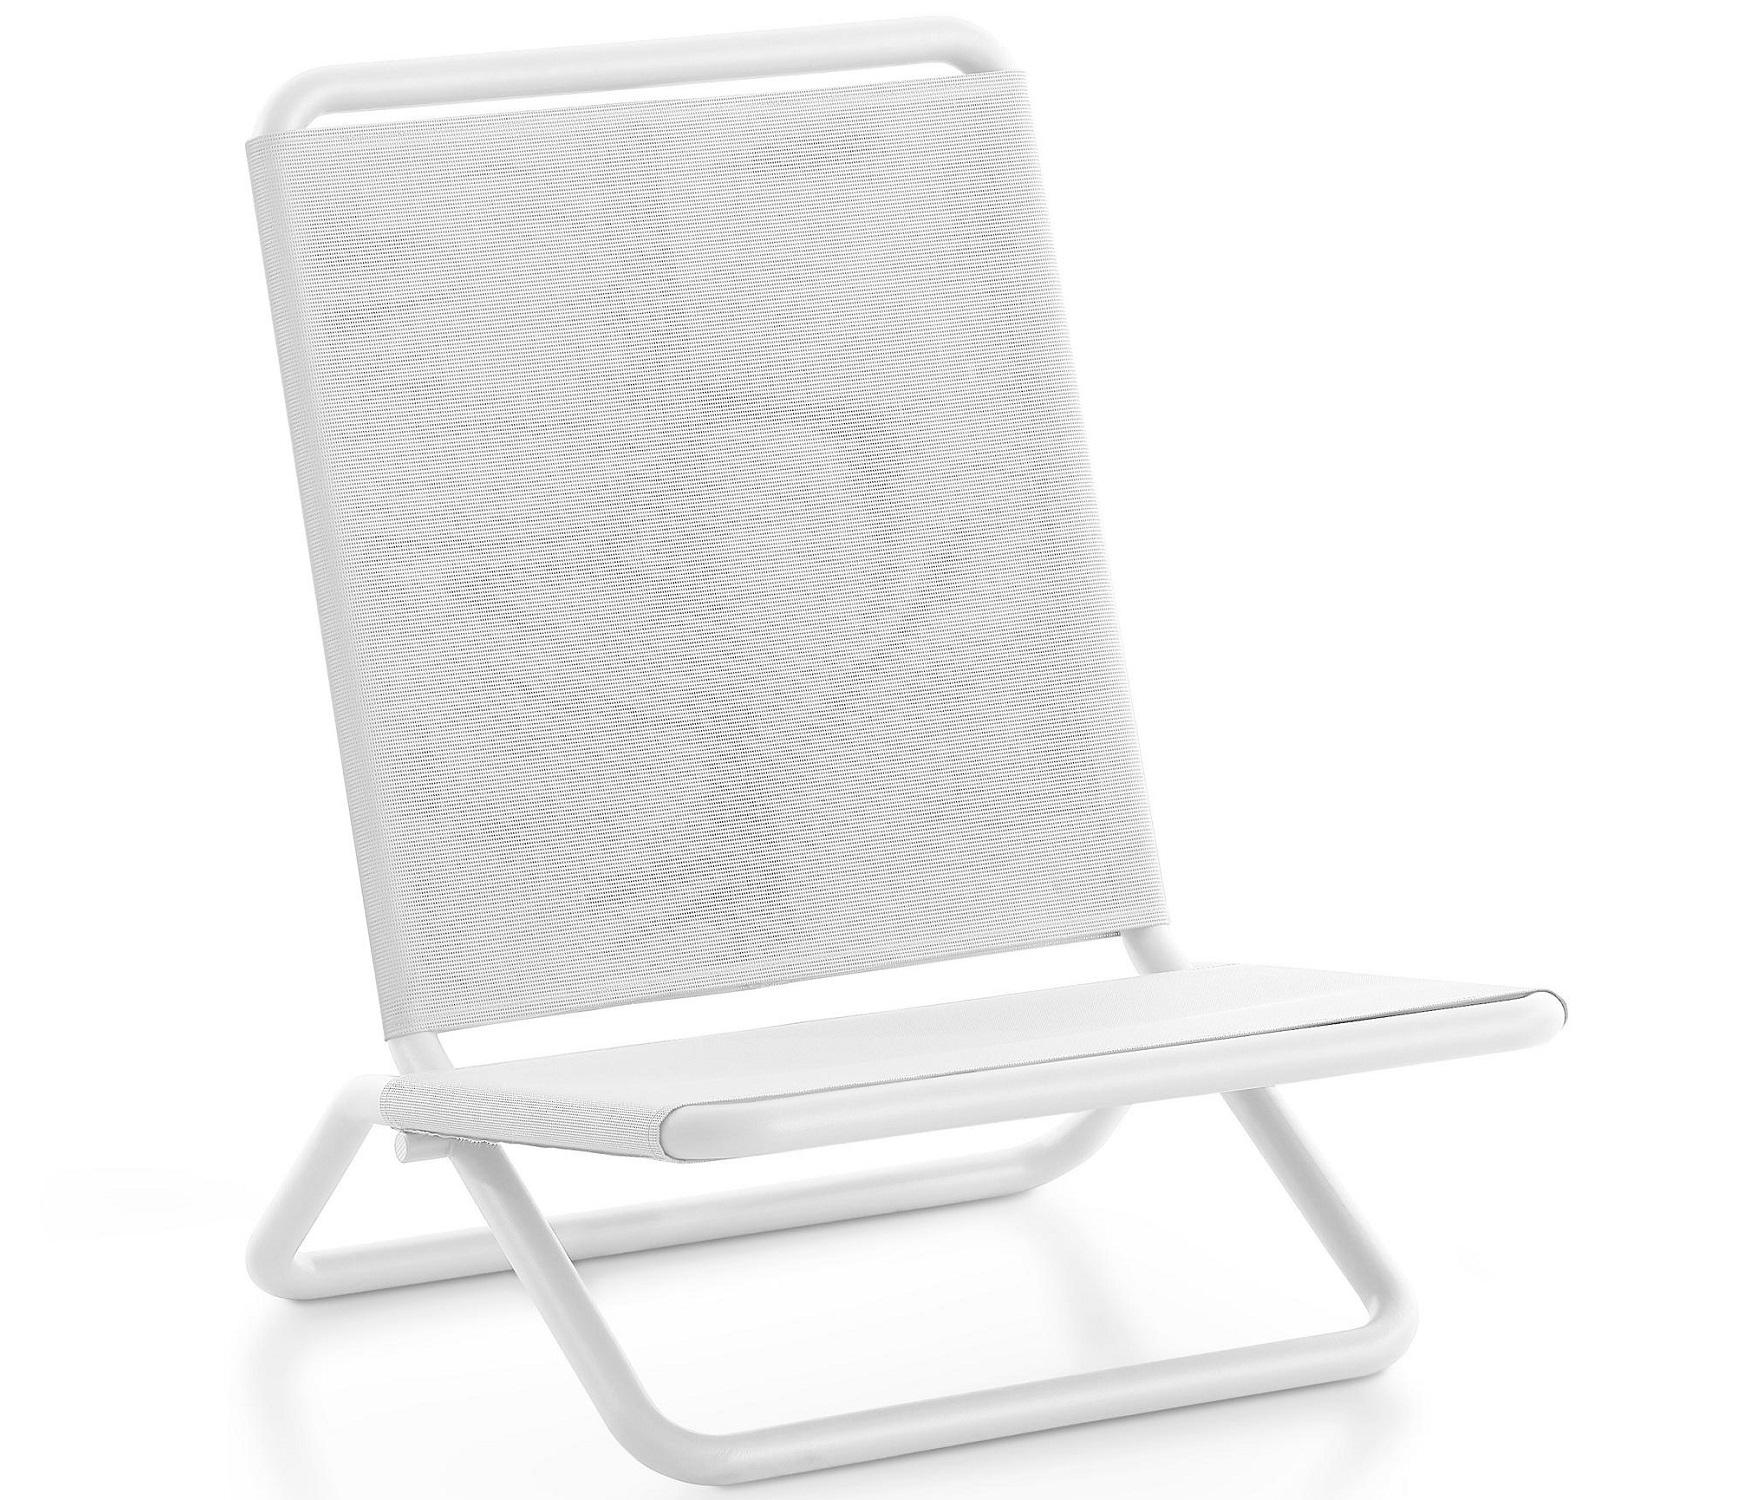 Diabla designová zahradní křesla Trip Chair